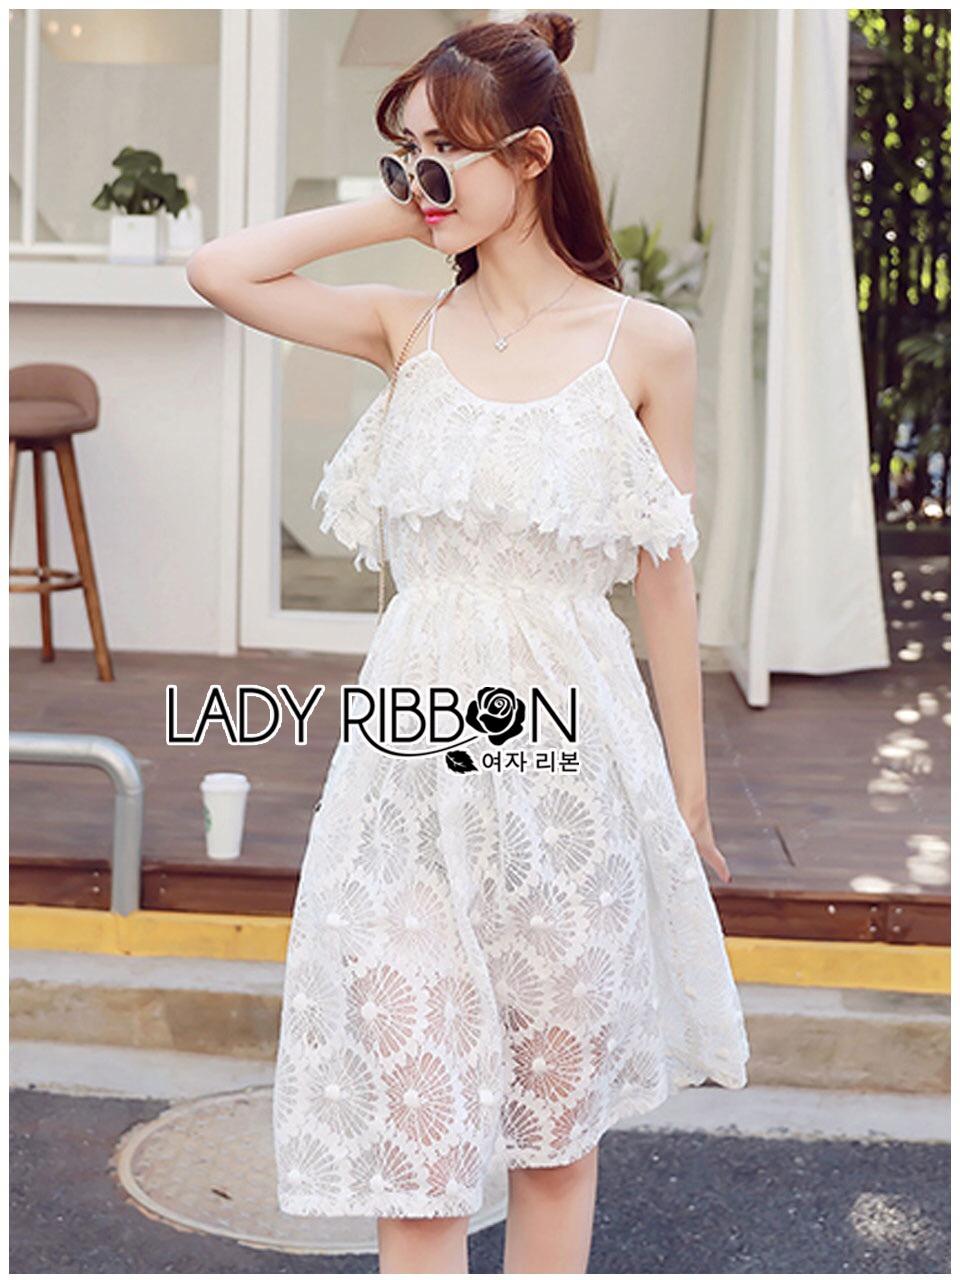 Lady Ribbon Korea Dress &#x1F380 Lady Ribbon's Made &#x1F380 Lady Lauretta Pure Summer Off-Shoulder White Lace Dress